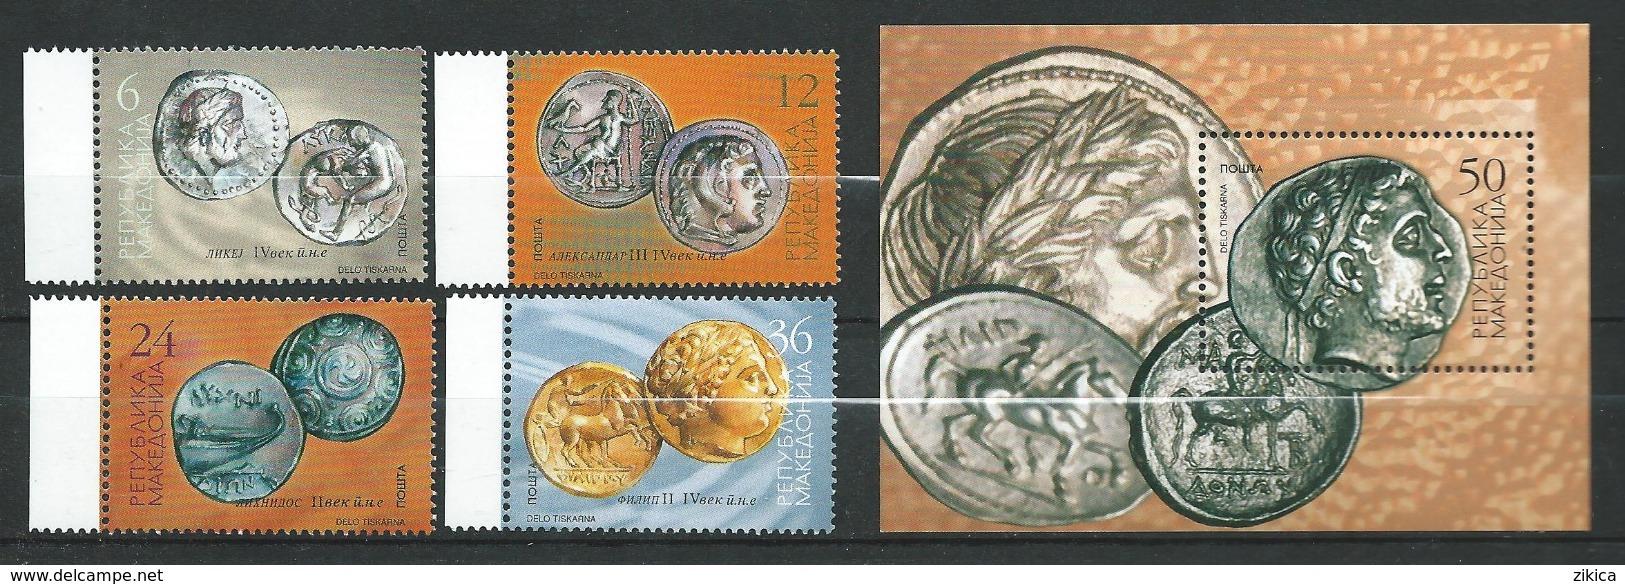 Macedonia / Macedoine 2002 Cultural Heritage - Coins.Stamp And Block.MNH - Macedonia